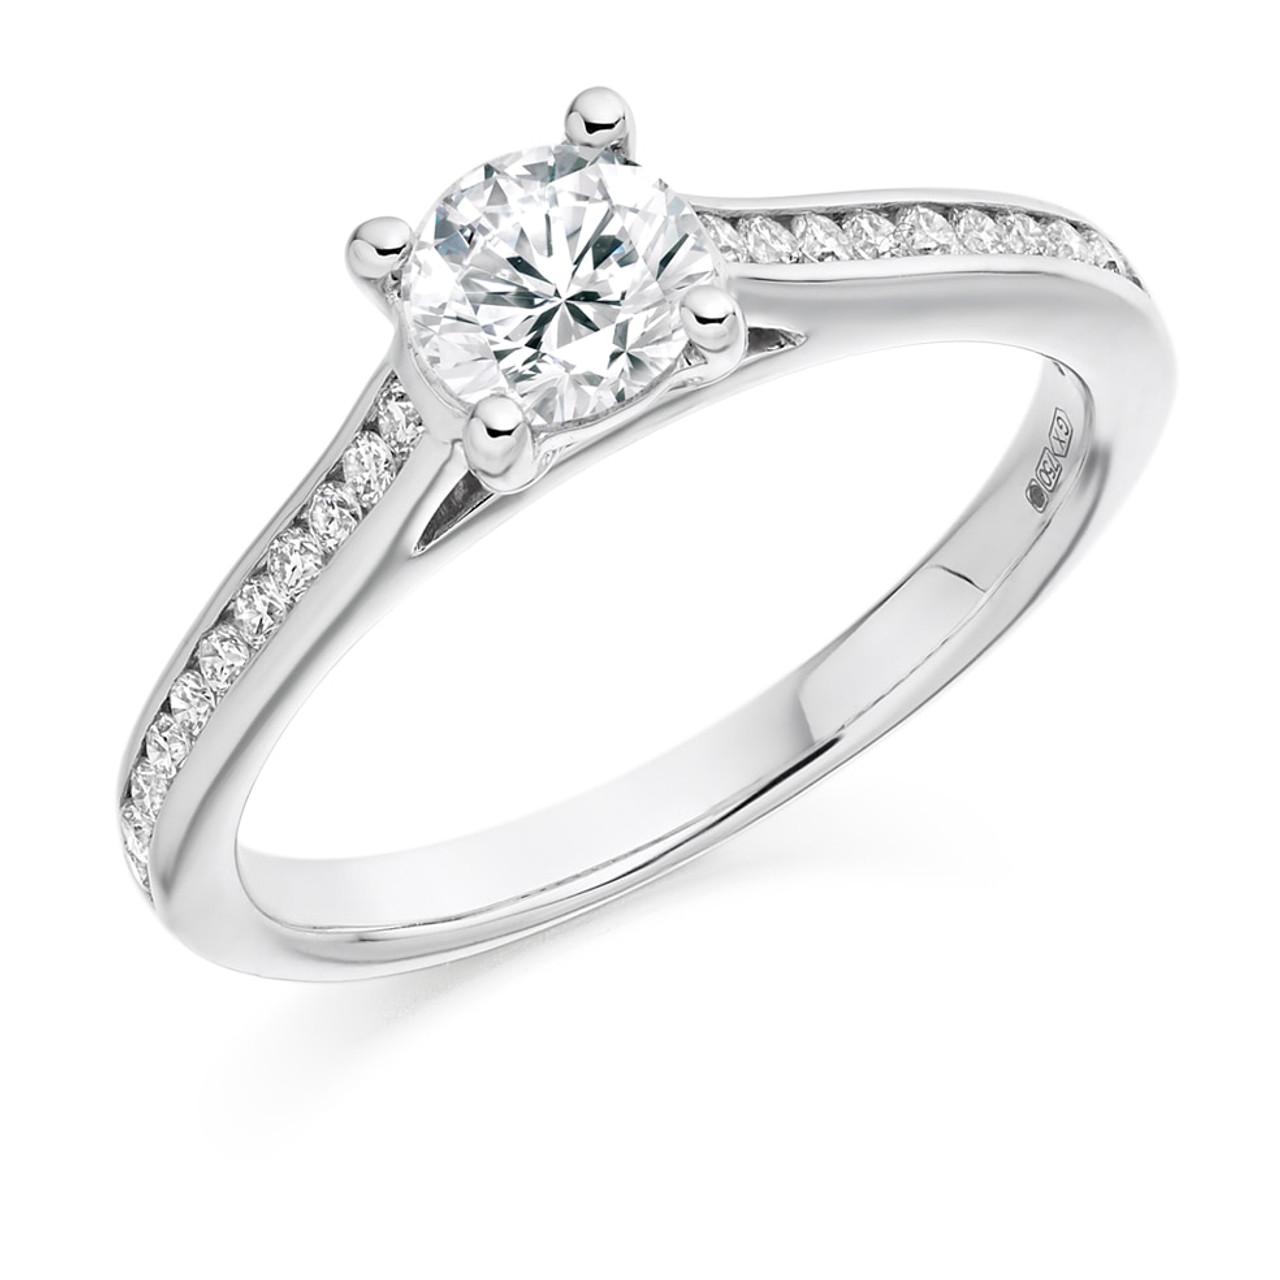 Hawthorn 0.50ct Diamond Engagement Ring